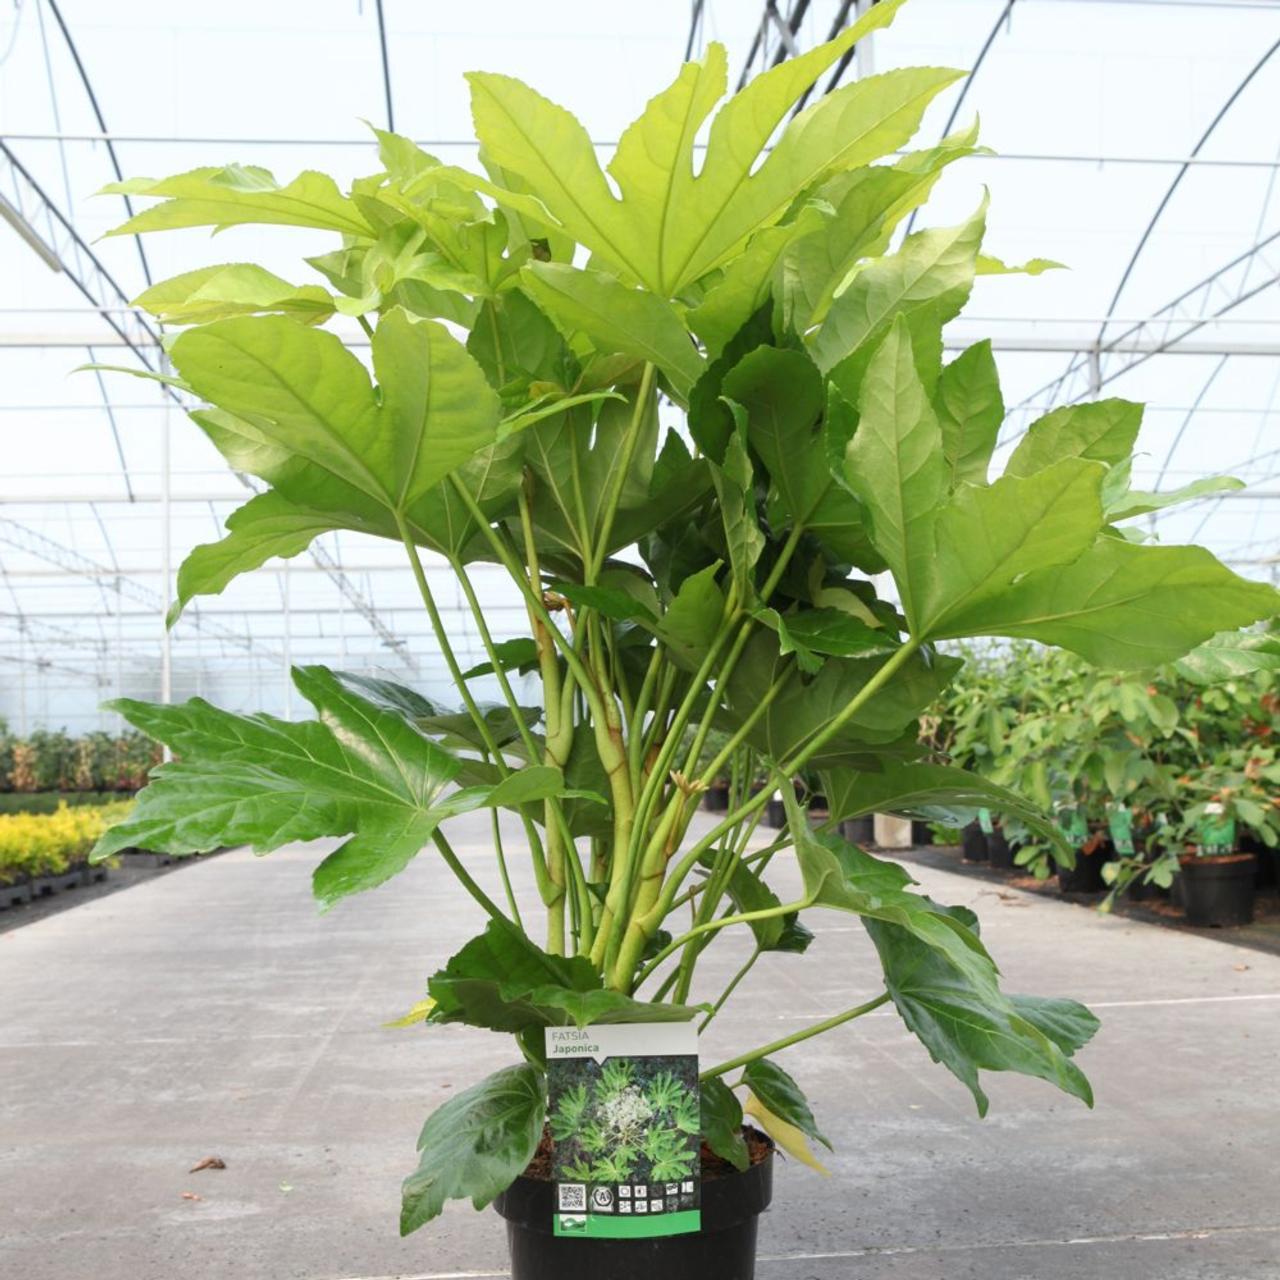 Fatsia japonica plant